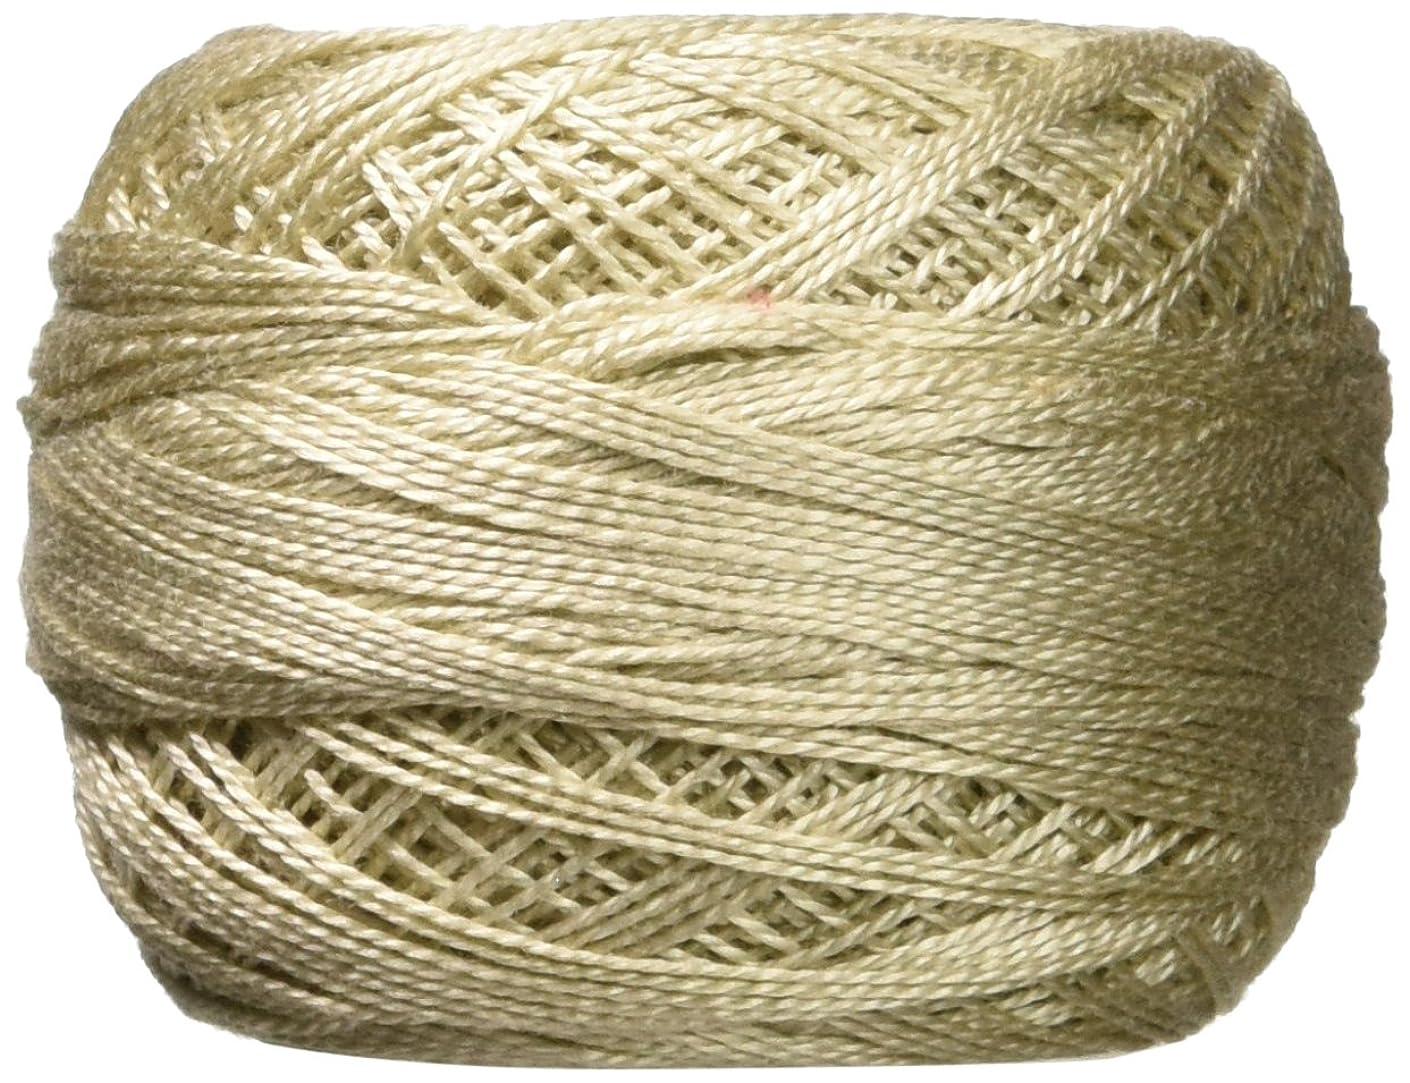 DMC 116 12-644 Pearl Cotton Thread Balls, Medium Beige Gray, Size 12